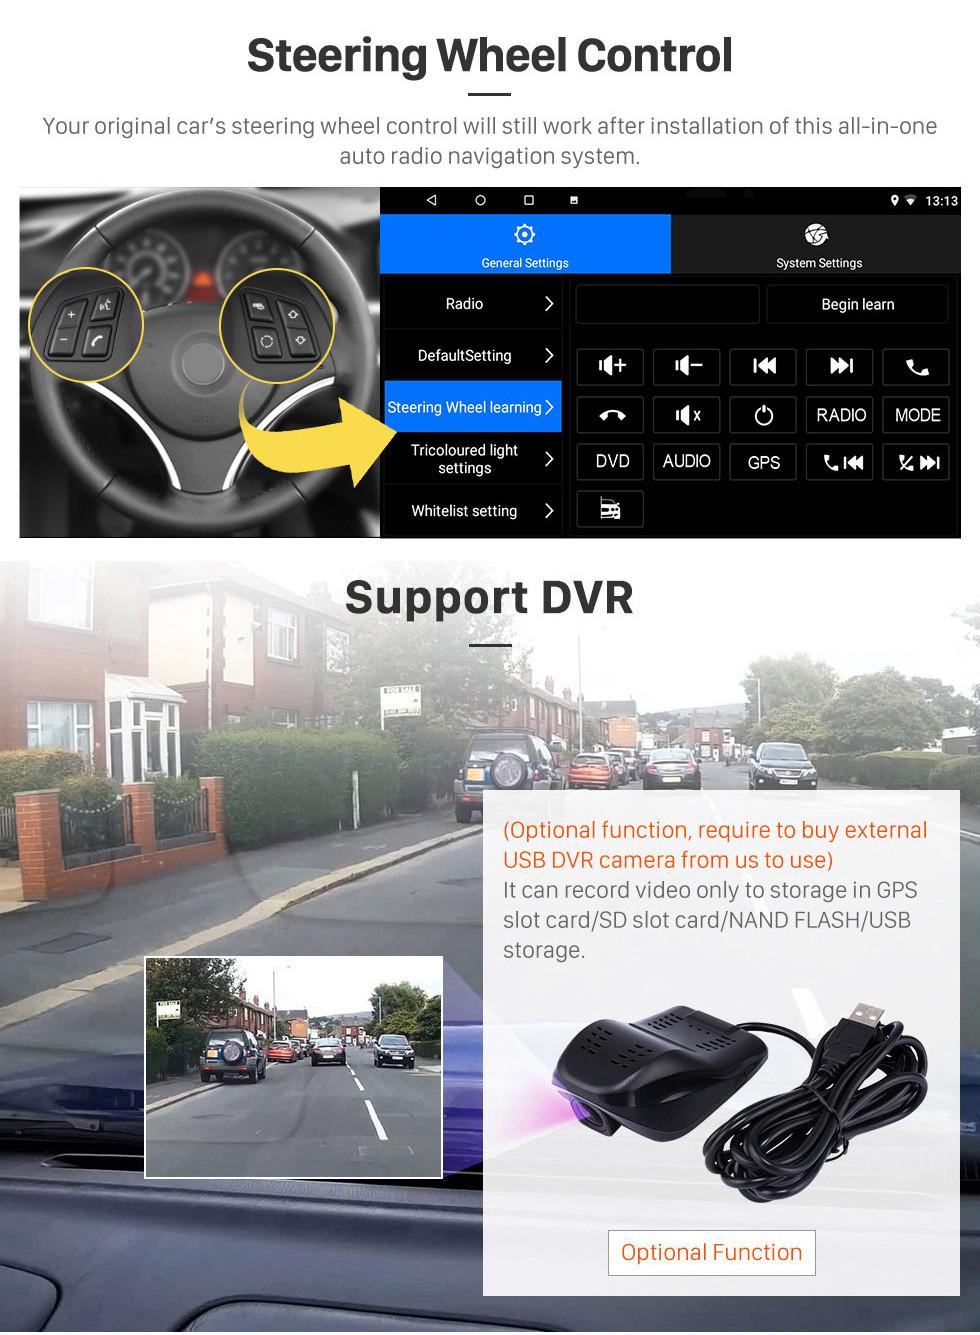 Seicane 2010-2015 TOYOTA REIZ Mark X 9 inch Android 10.0 HD Touchscreen Bluetooth Radio GPS Navigation Stereo USB AUX support Carplay 3G WIFI Mirror Link